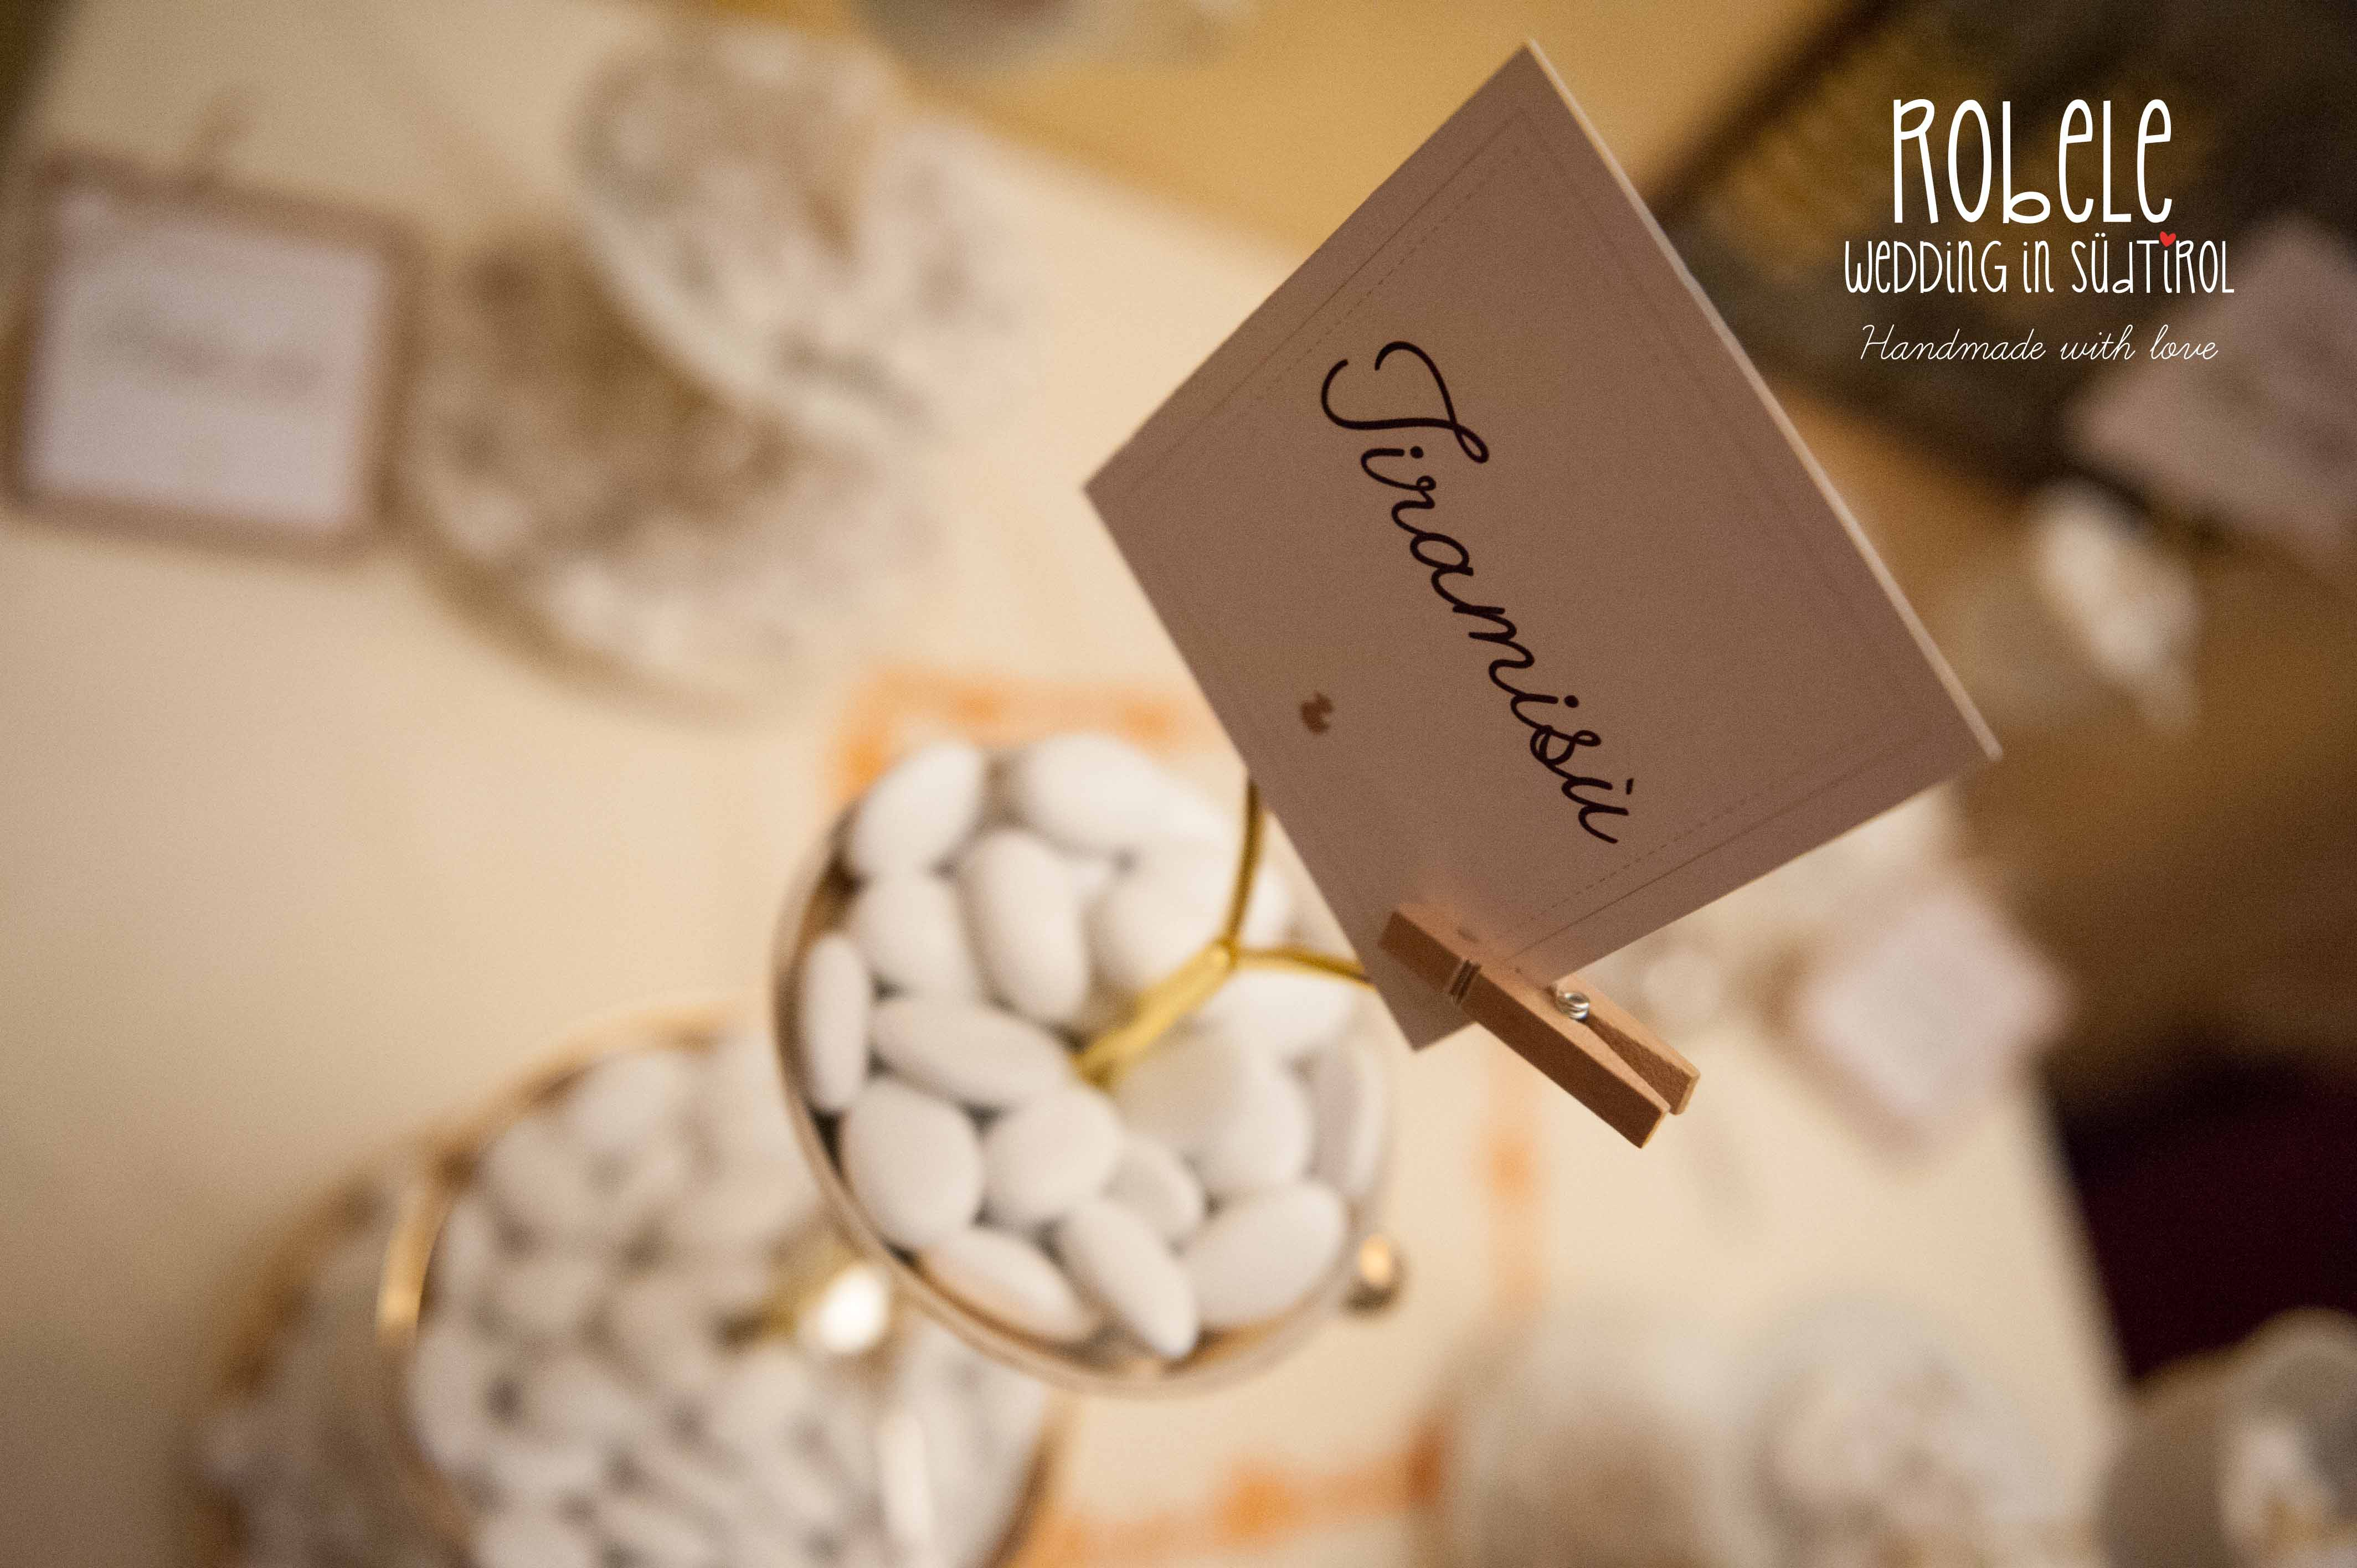 antonella-alex_foto-sara-bonvicini-422